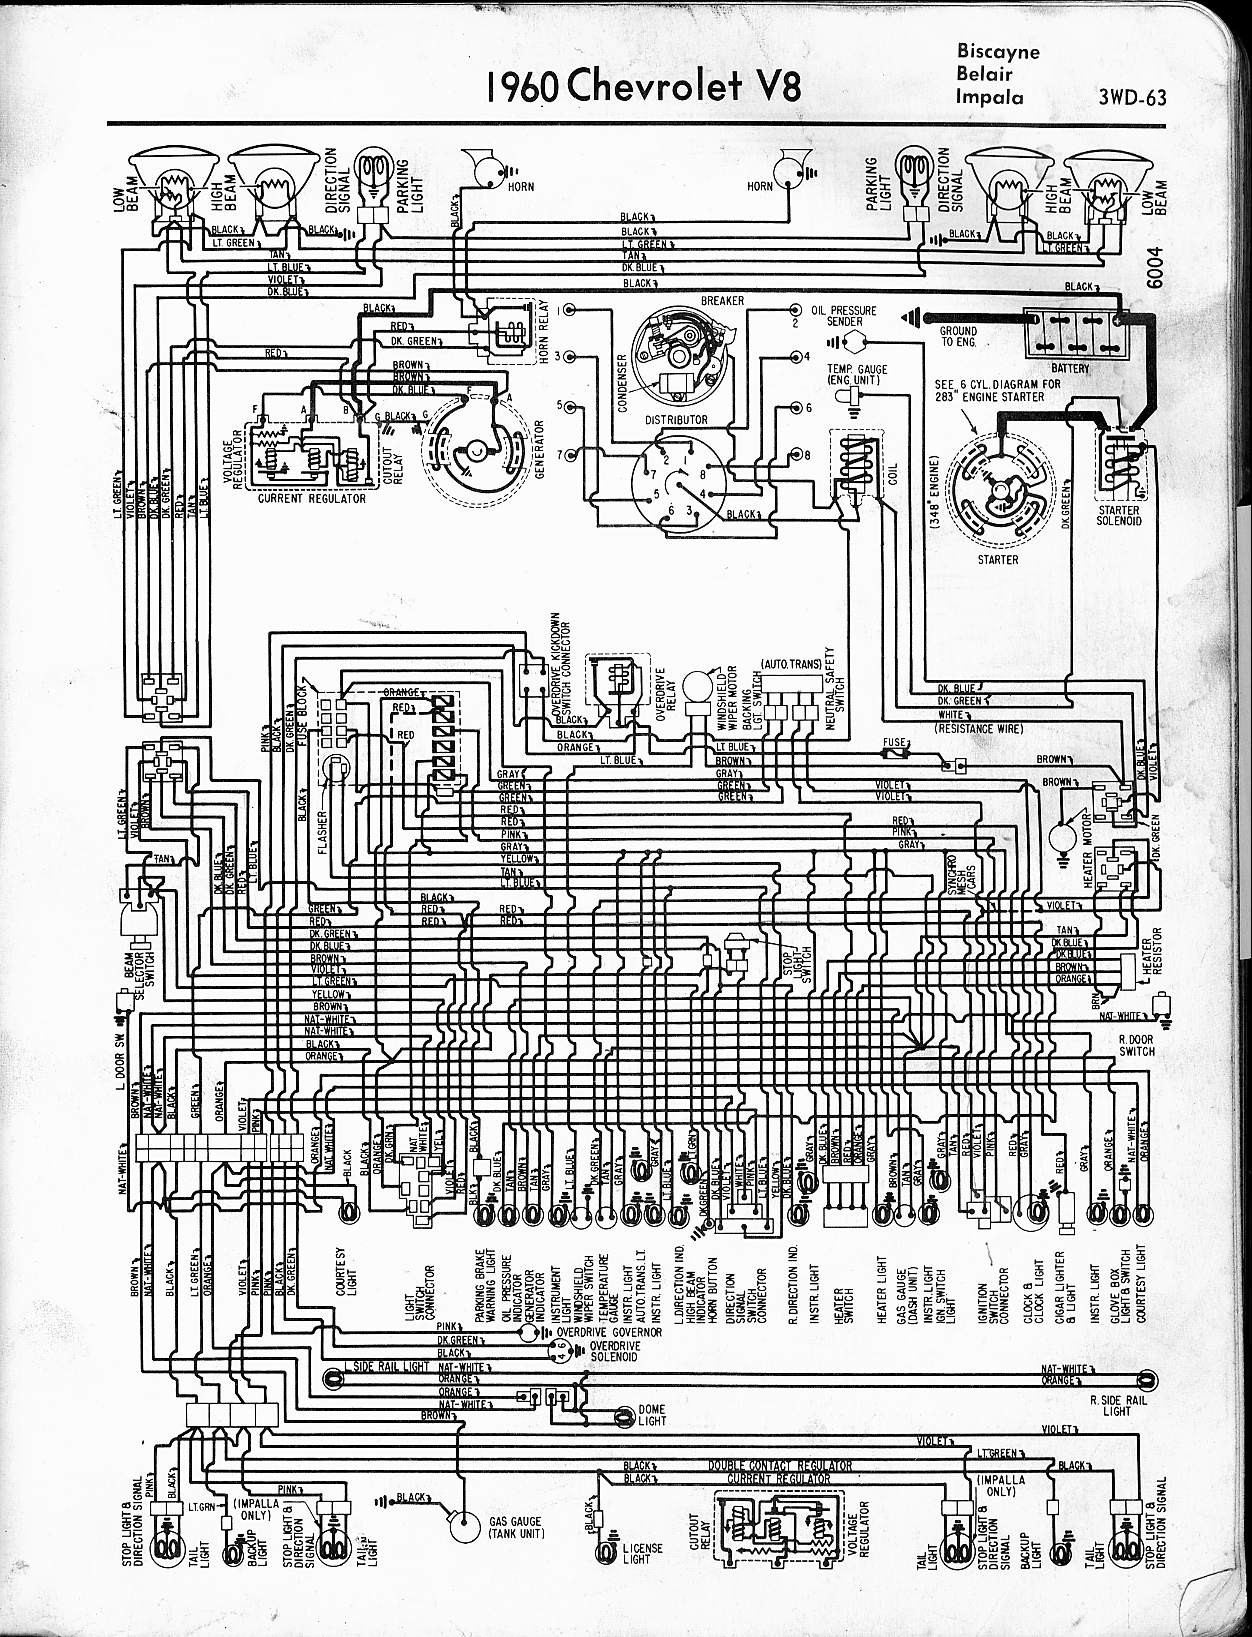 Chevy Tilt Steering Column Wiring Diagram Valid 1972 Chevy Truck - Chevy Tilt Steering Column Wiring Diagram